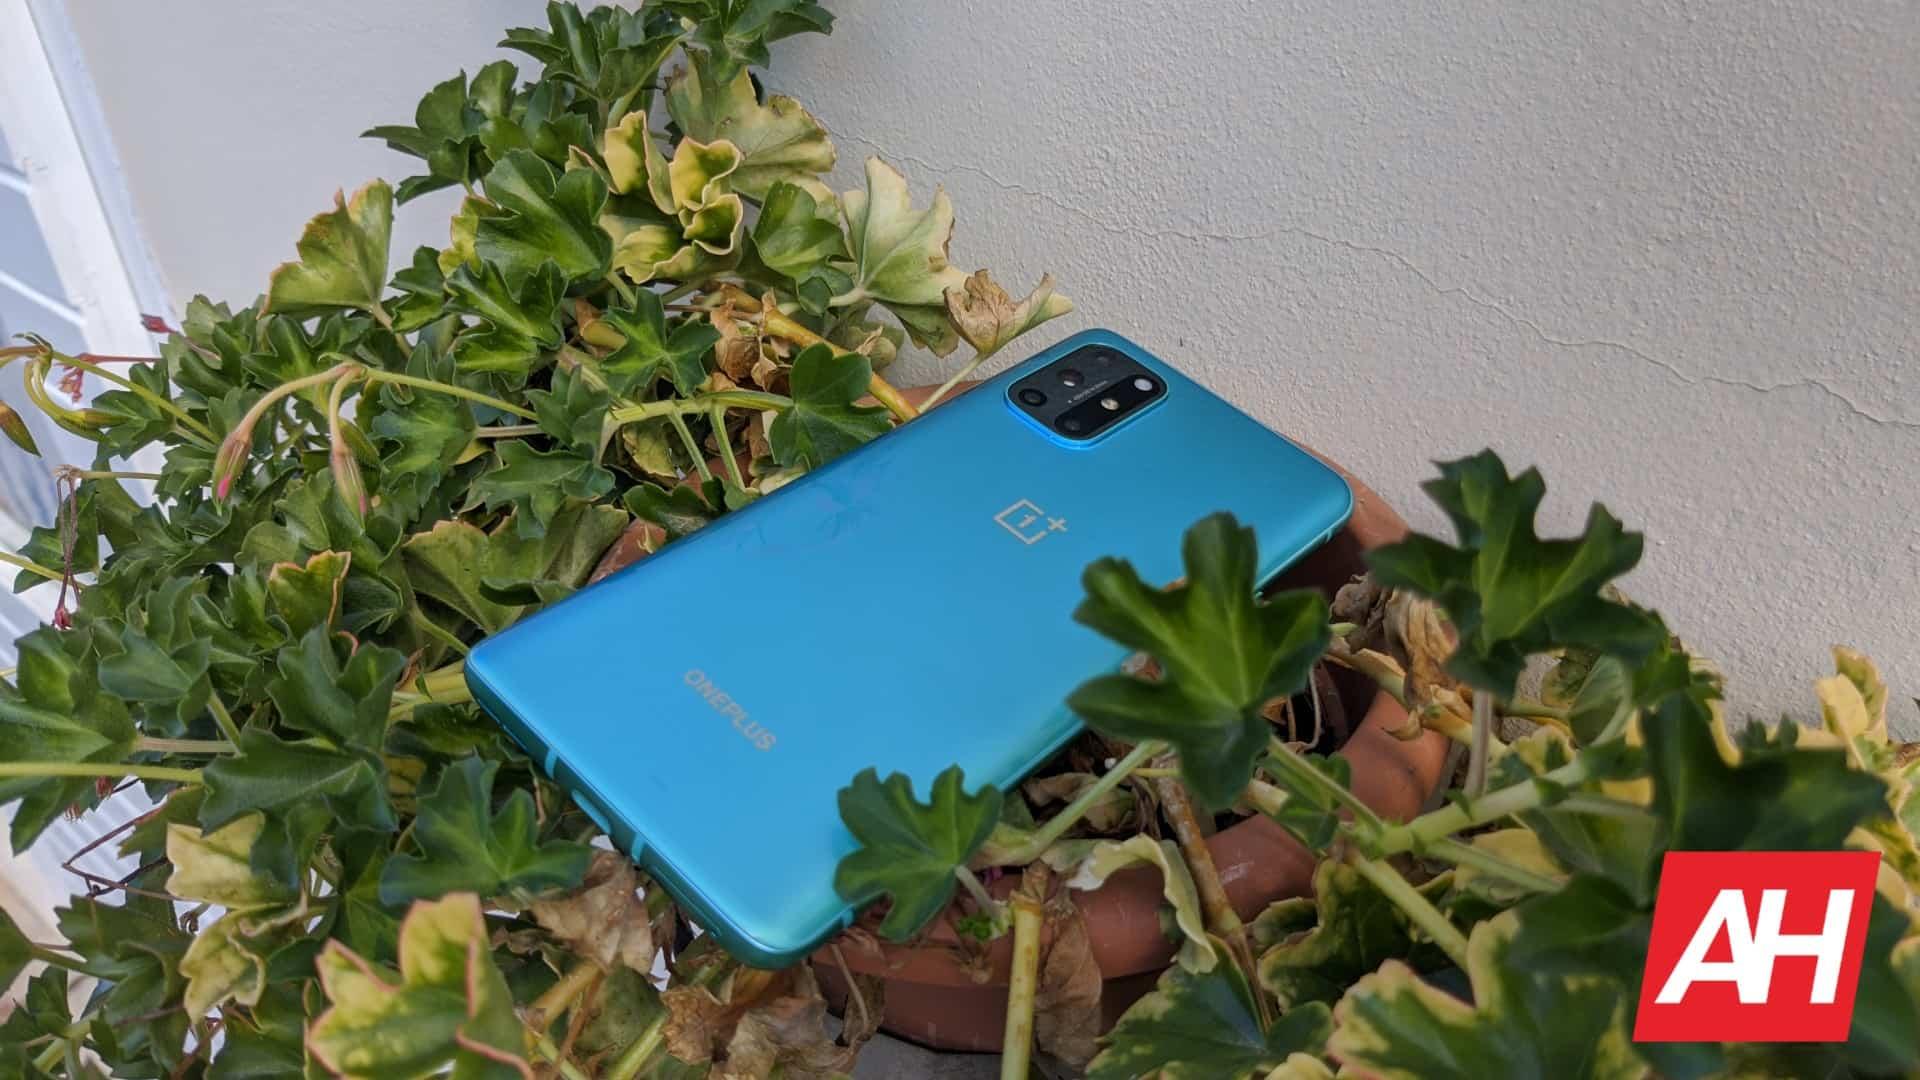 AH OnePlus 8T image 104